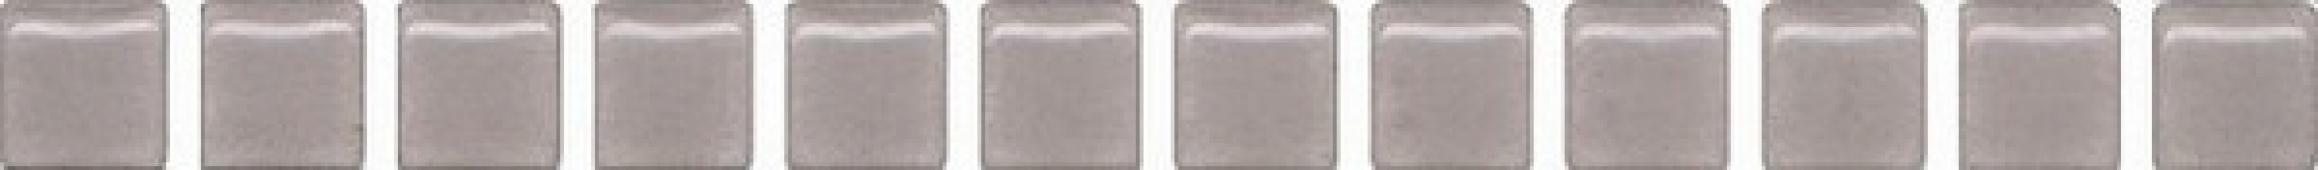 POF014 Карандаш Бисер серый матовый 20*1.4 керамический бордюр